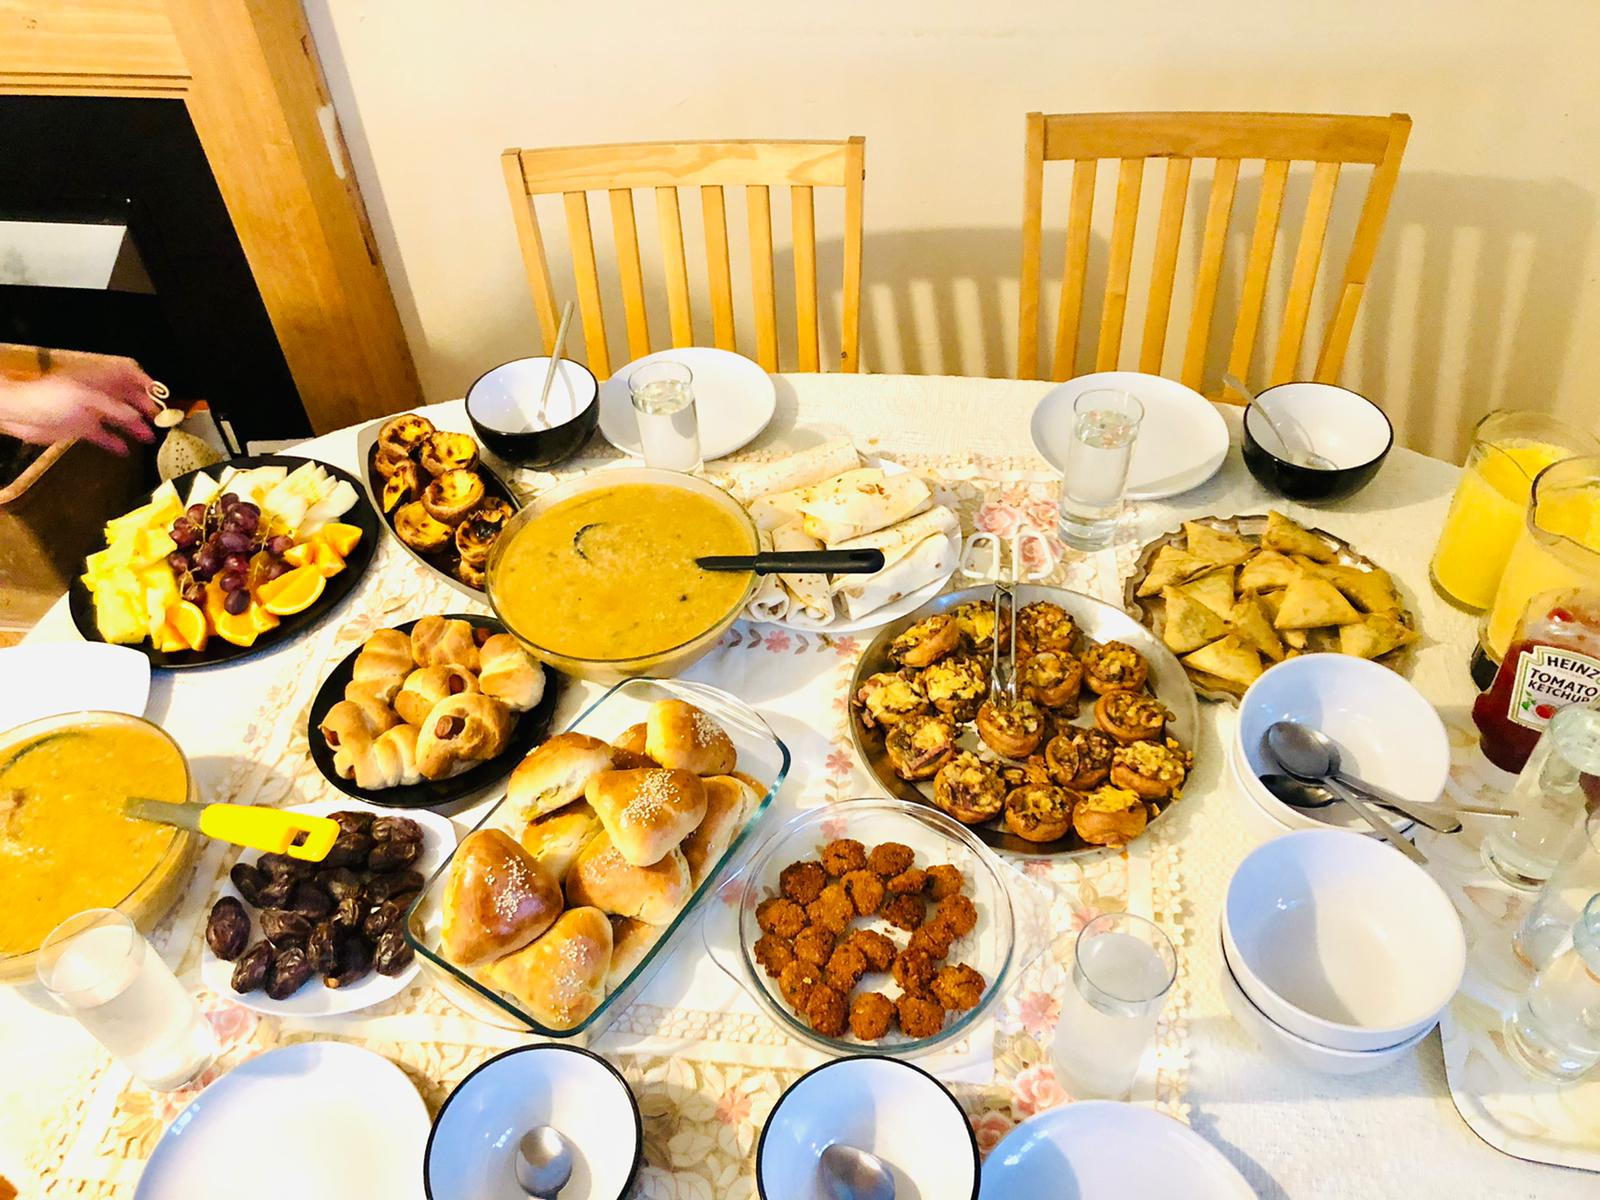 Homemade food for Ifar